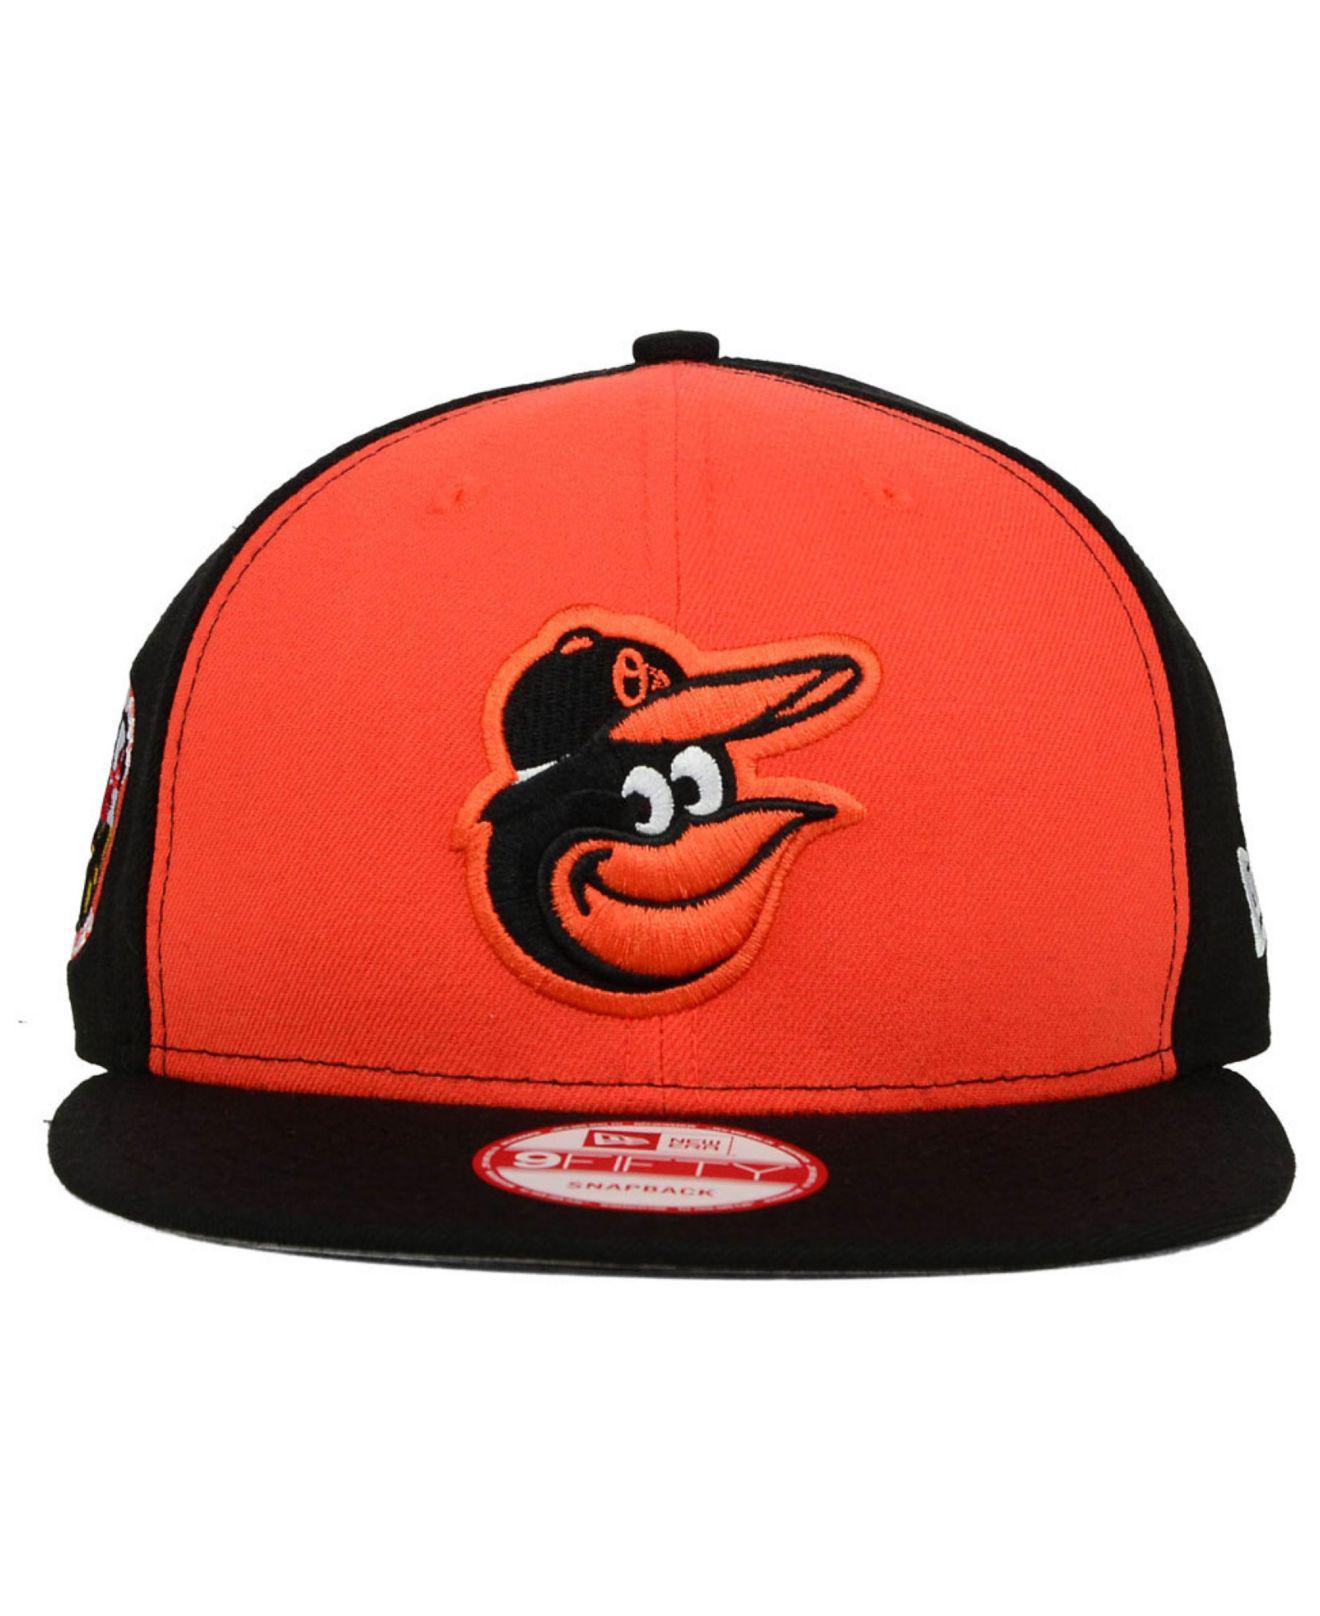 Lyst - Ktz Baltimore Orioles 2-tone 9fifty Snapback Cap in Orange for Men 24bc1bf88d3d